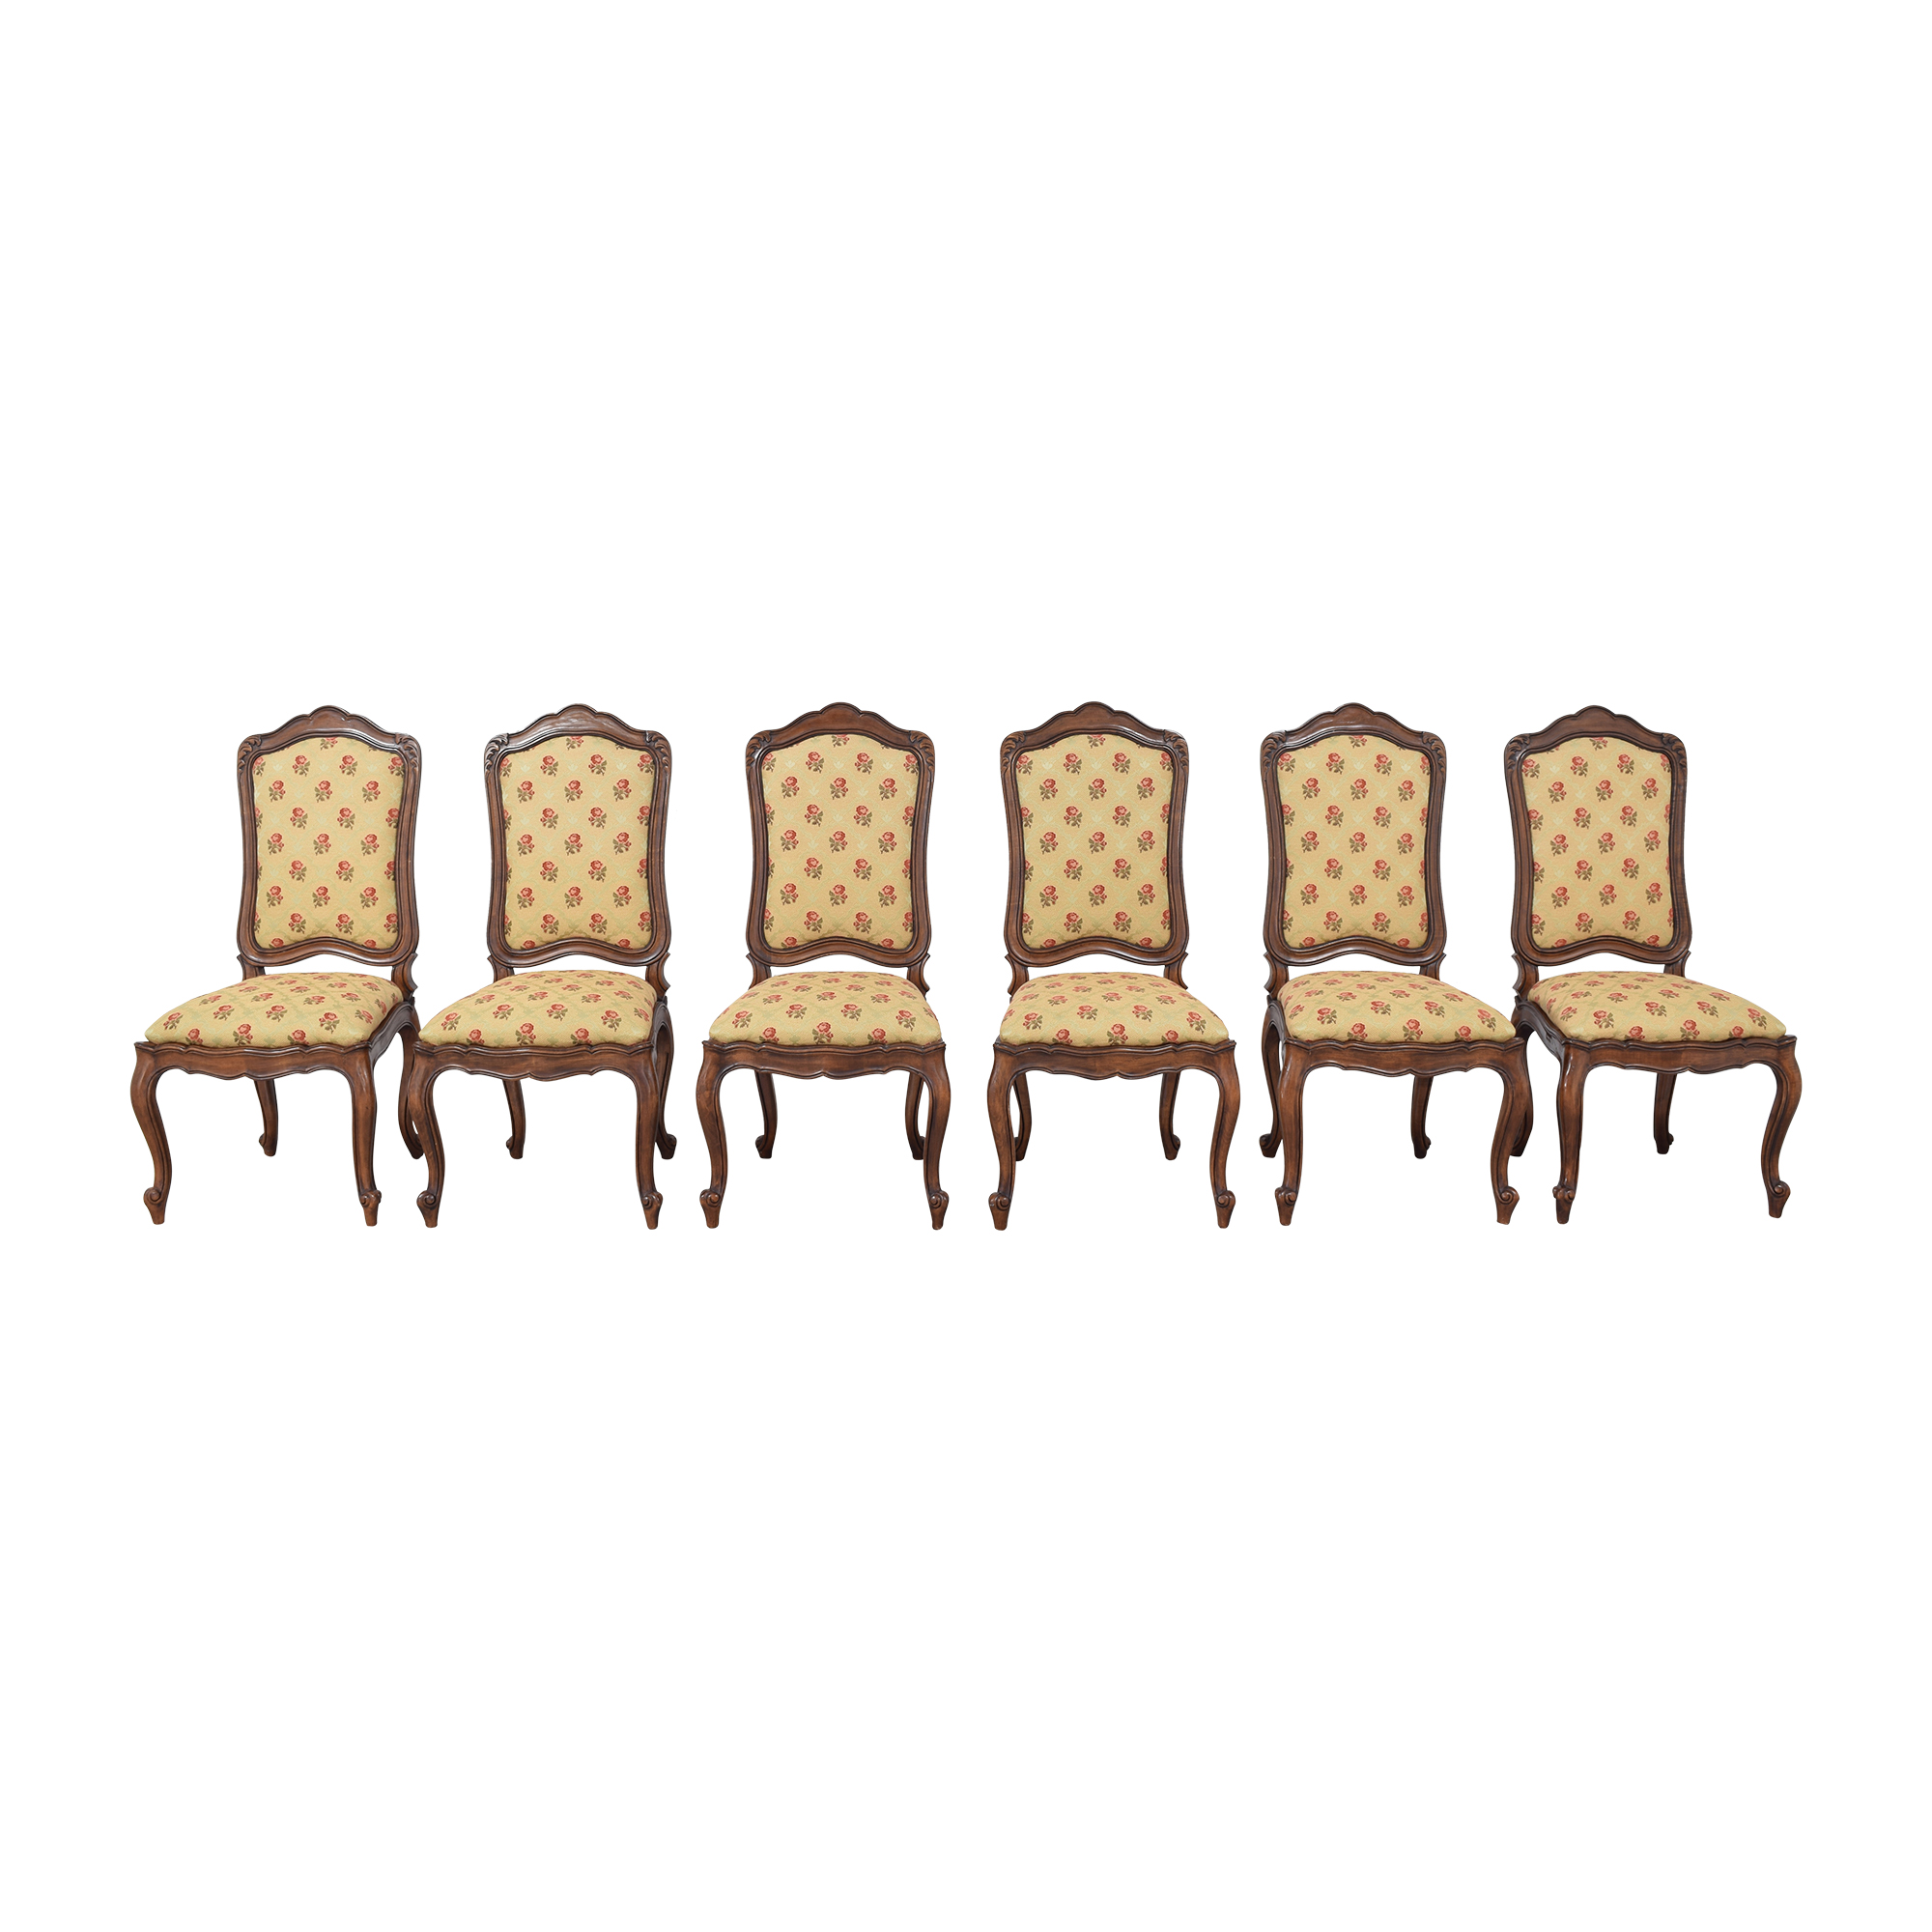 buy Bau Furniture Dining Side Chairs Bau Furniture